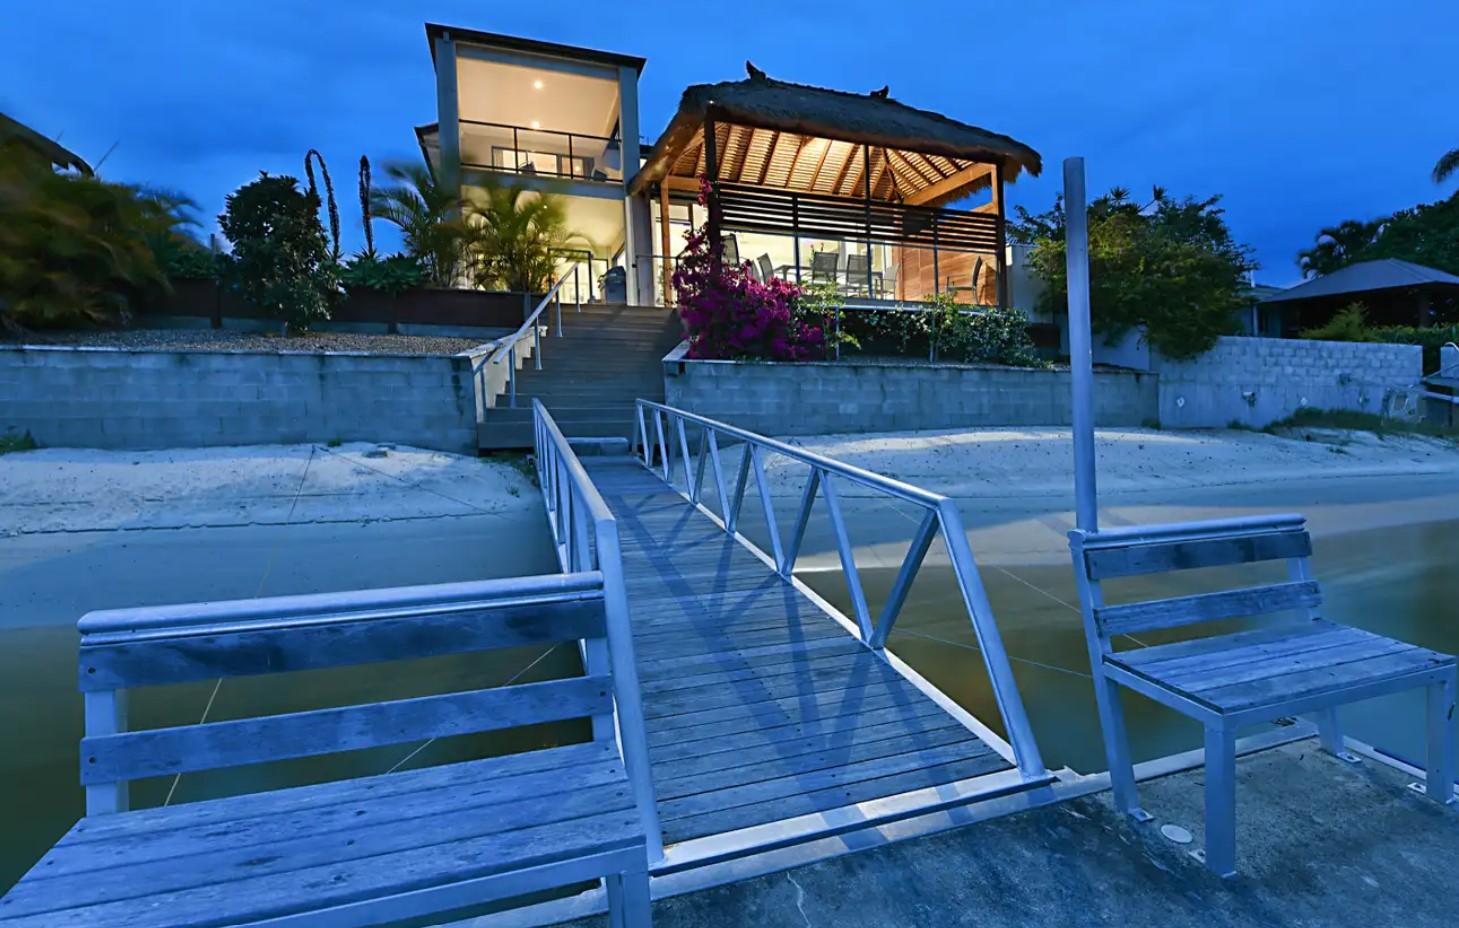 https://raywhitebroadbeach.com/properties/residential-for-sale/qld/broadbeach-waters-4218/house/2253430